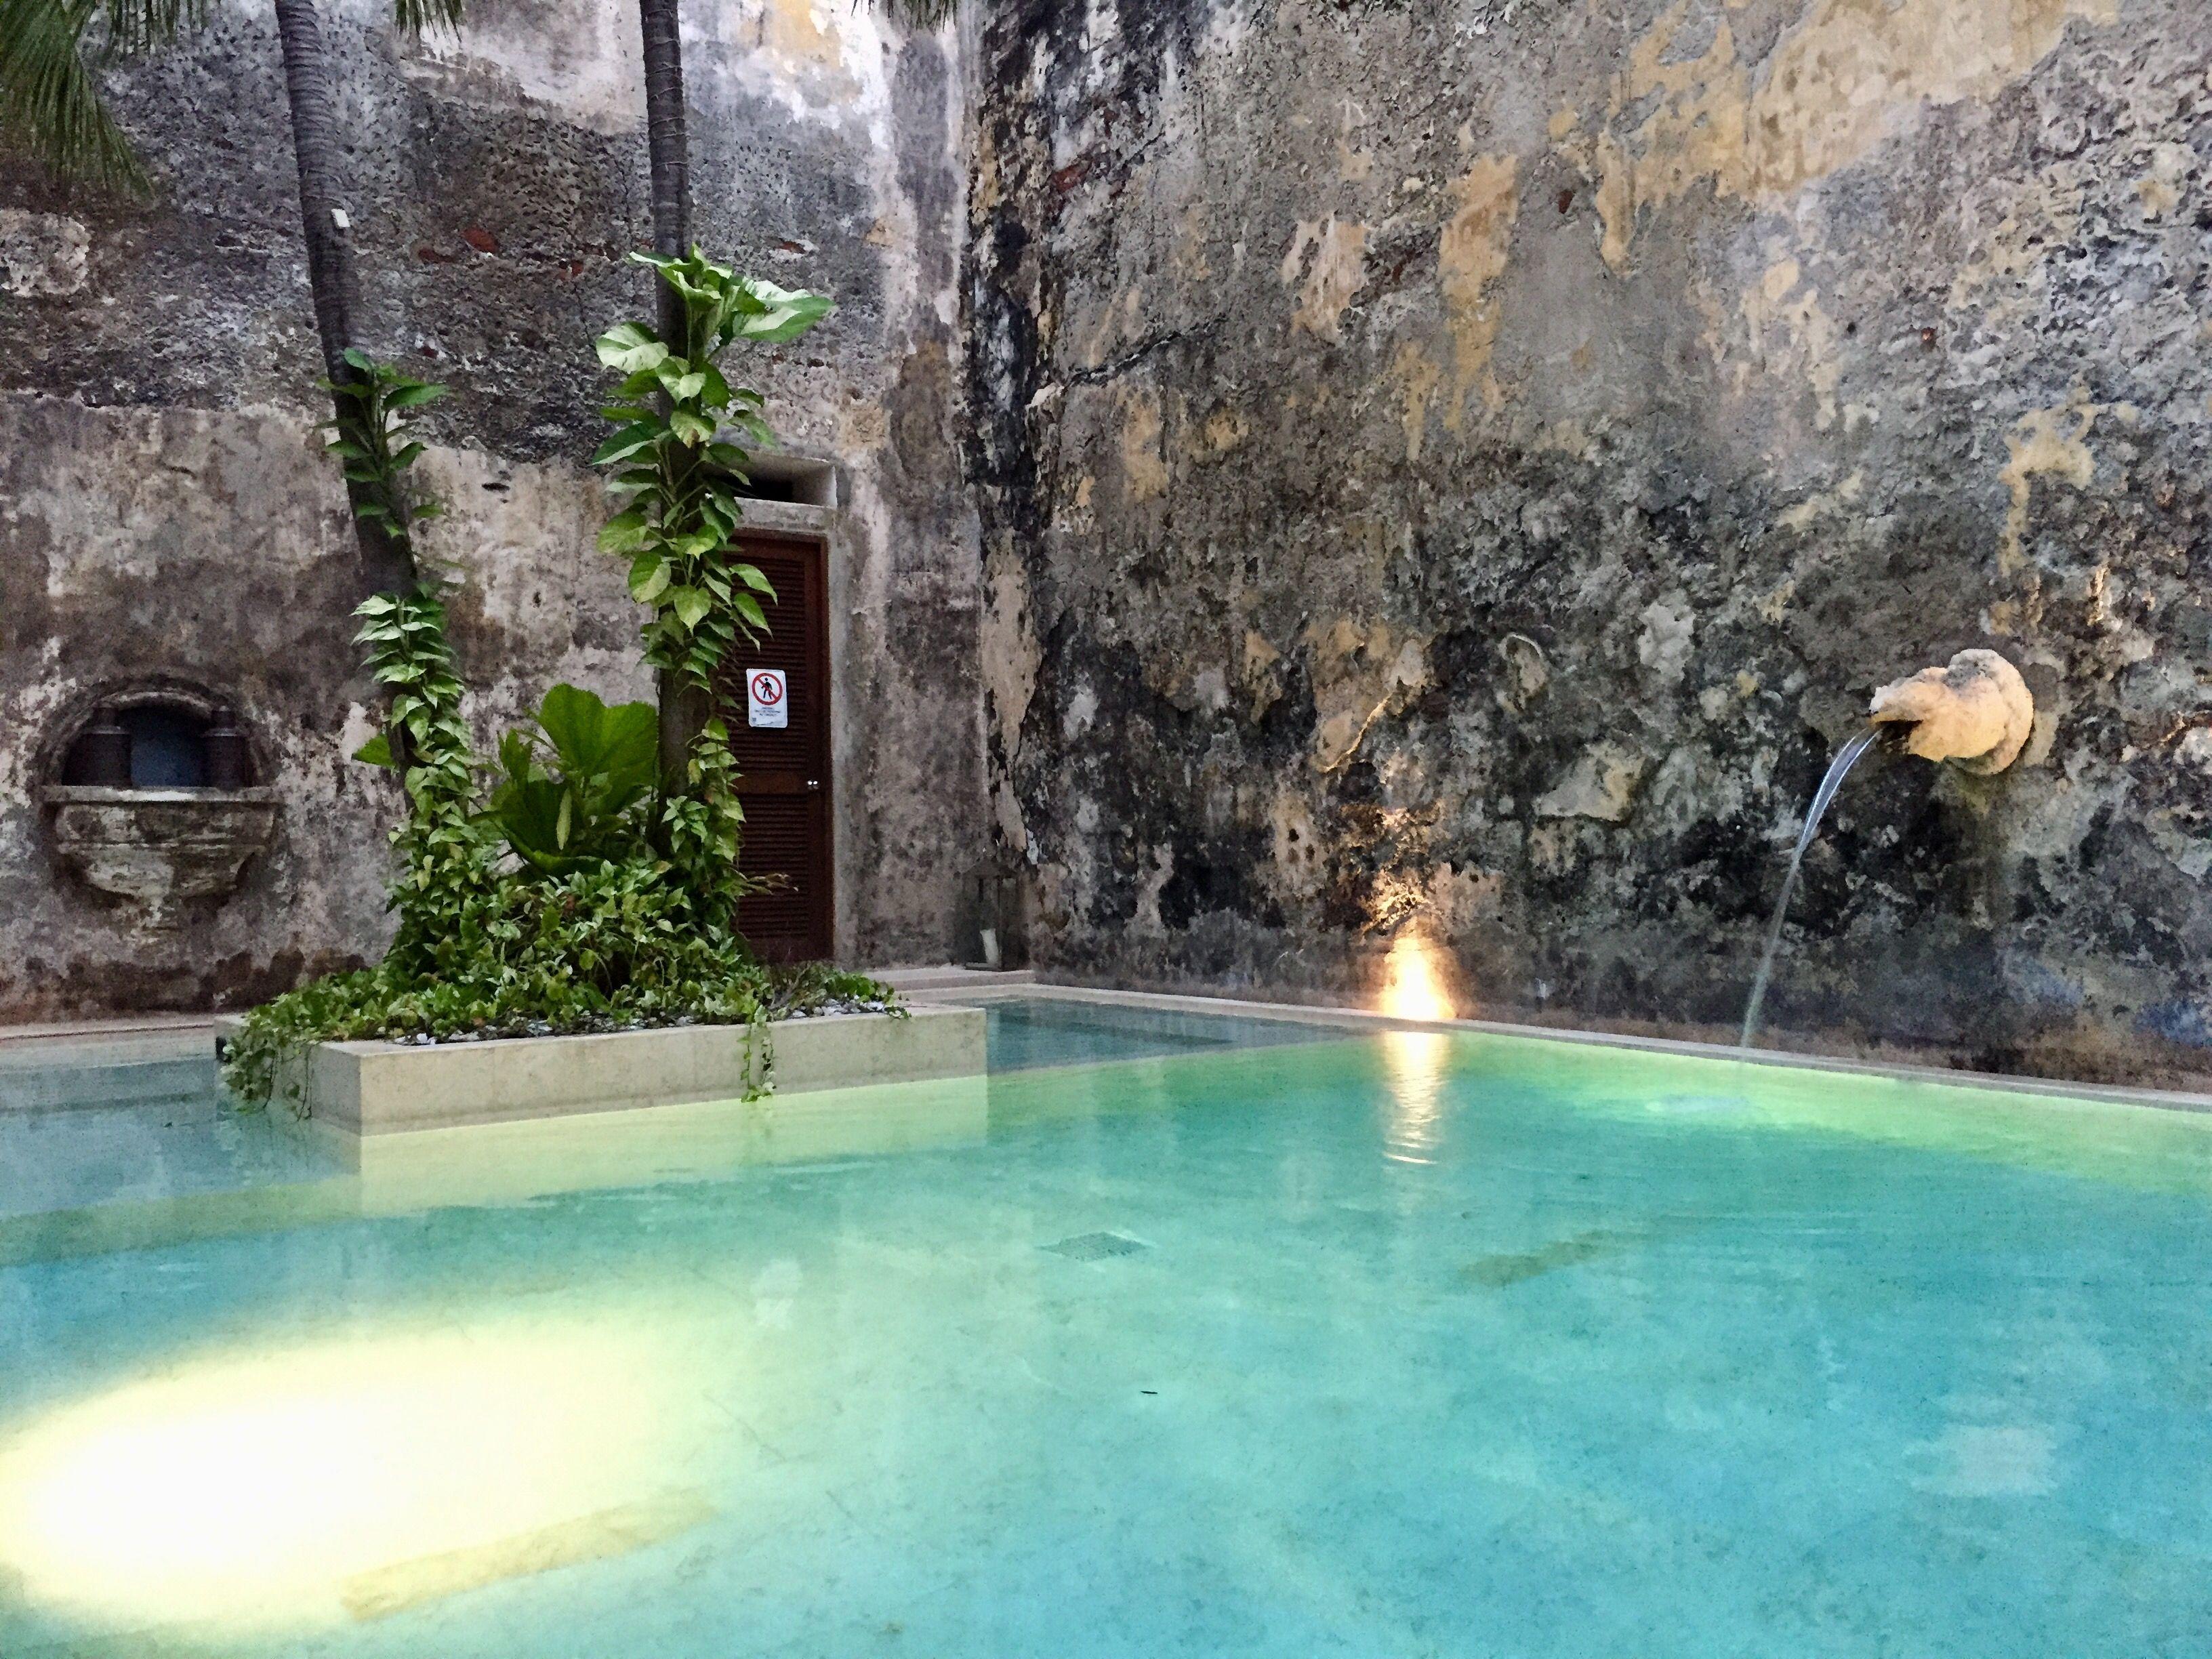 Perfekt #fernandoleonespacios #piscina #jardin #outdoors #pooltime #relax  #interiordesign #home